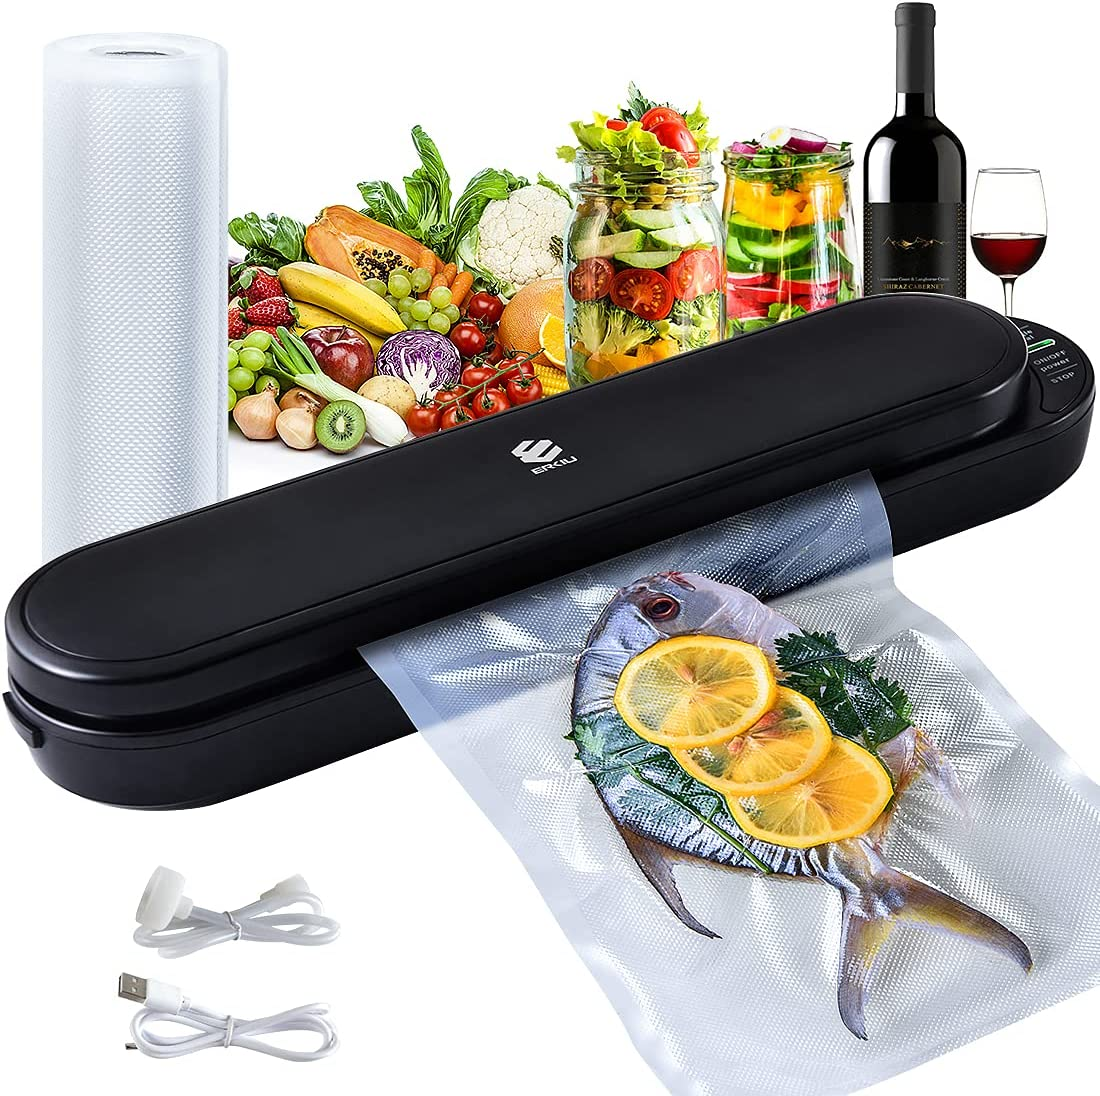 Cordless Vacuum Sealer Machine ERKIU S Sealing Air New mail order Food Max 69% OFF